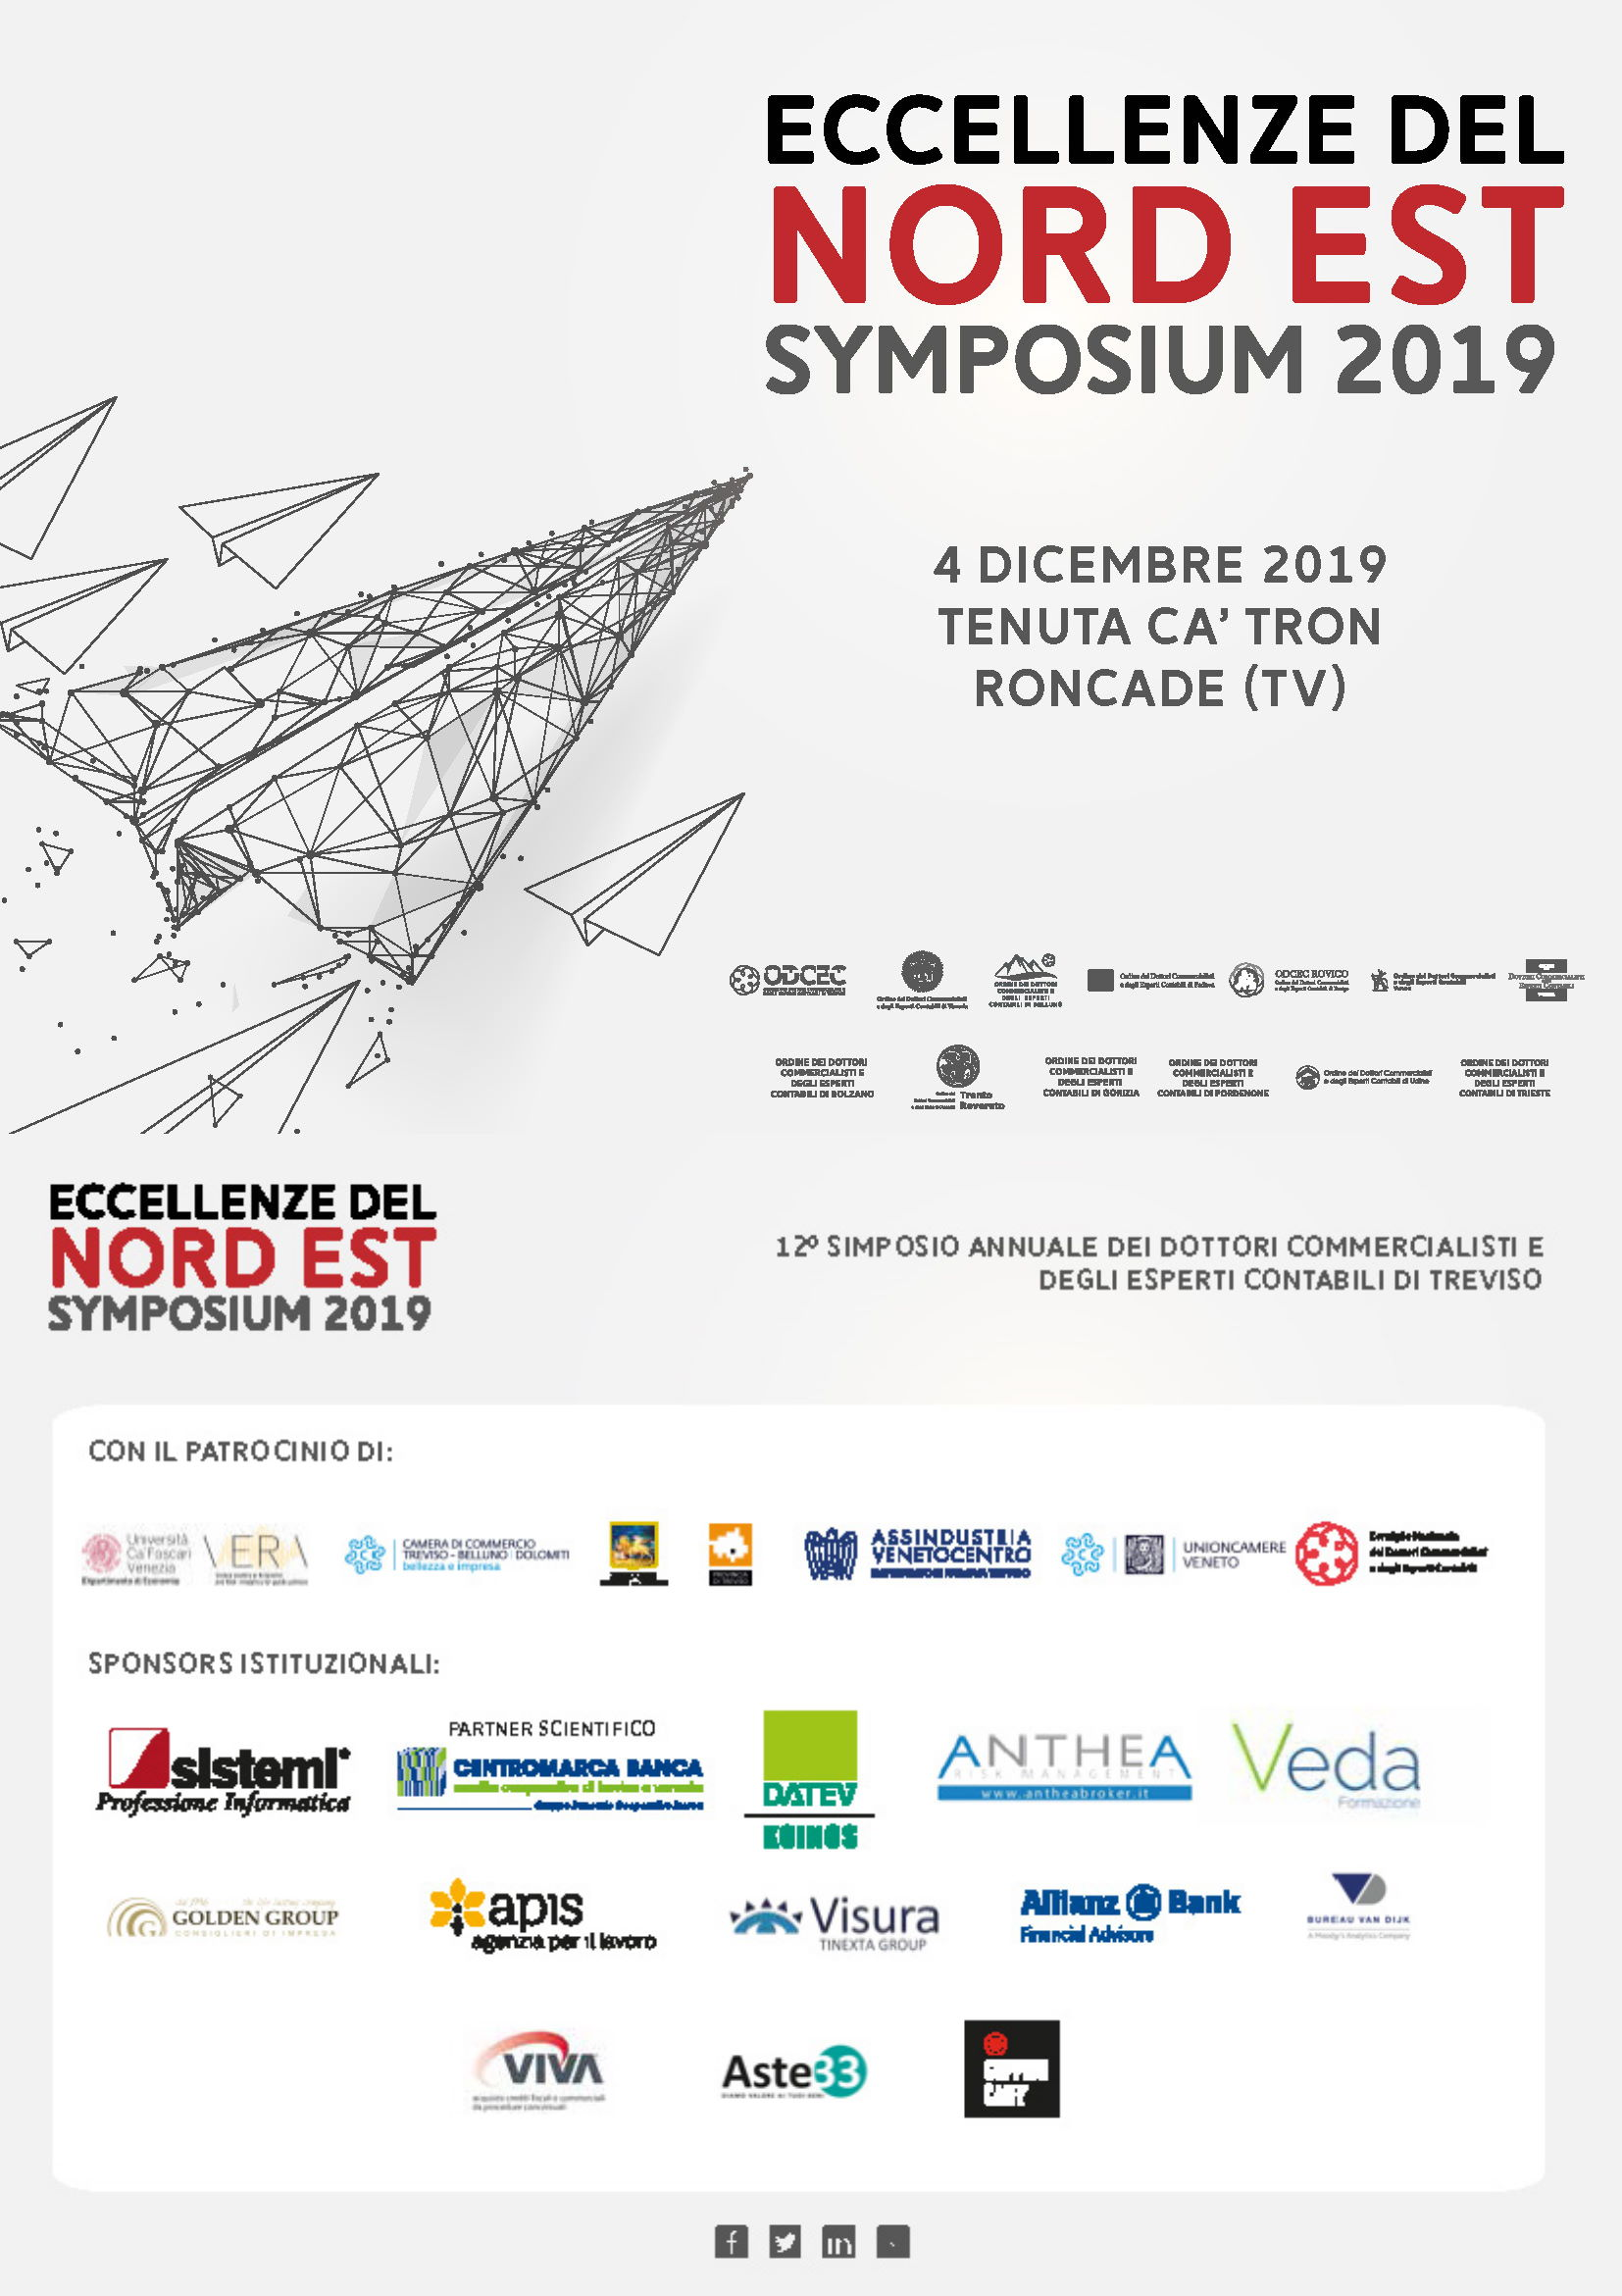 Symposium Eccellenze del Nord Est 4 dicembre 2019